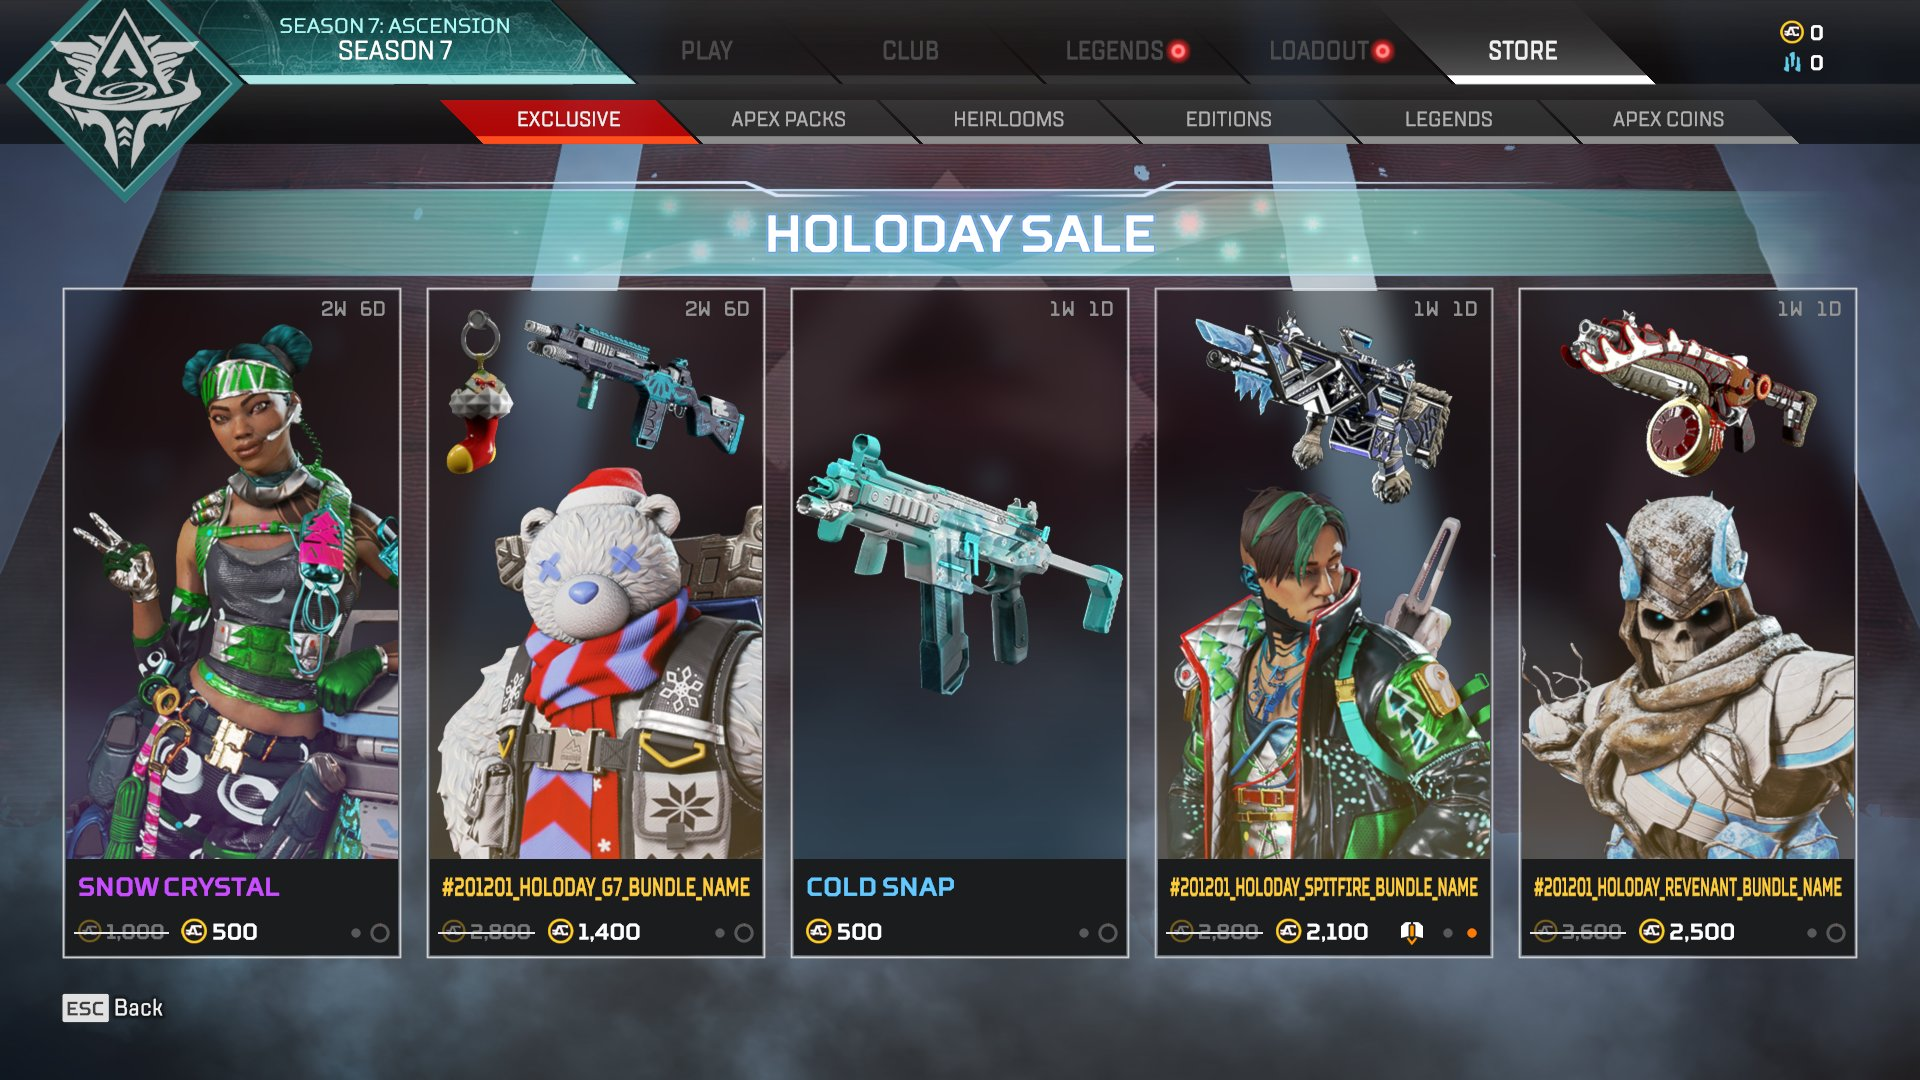 Holo-Days 2020 bundles price: